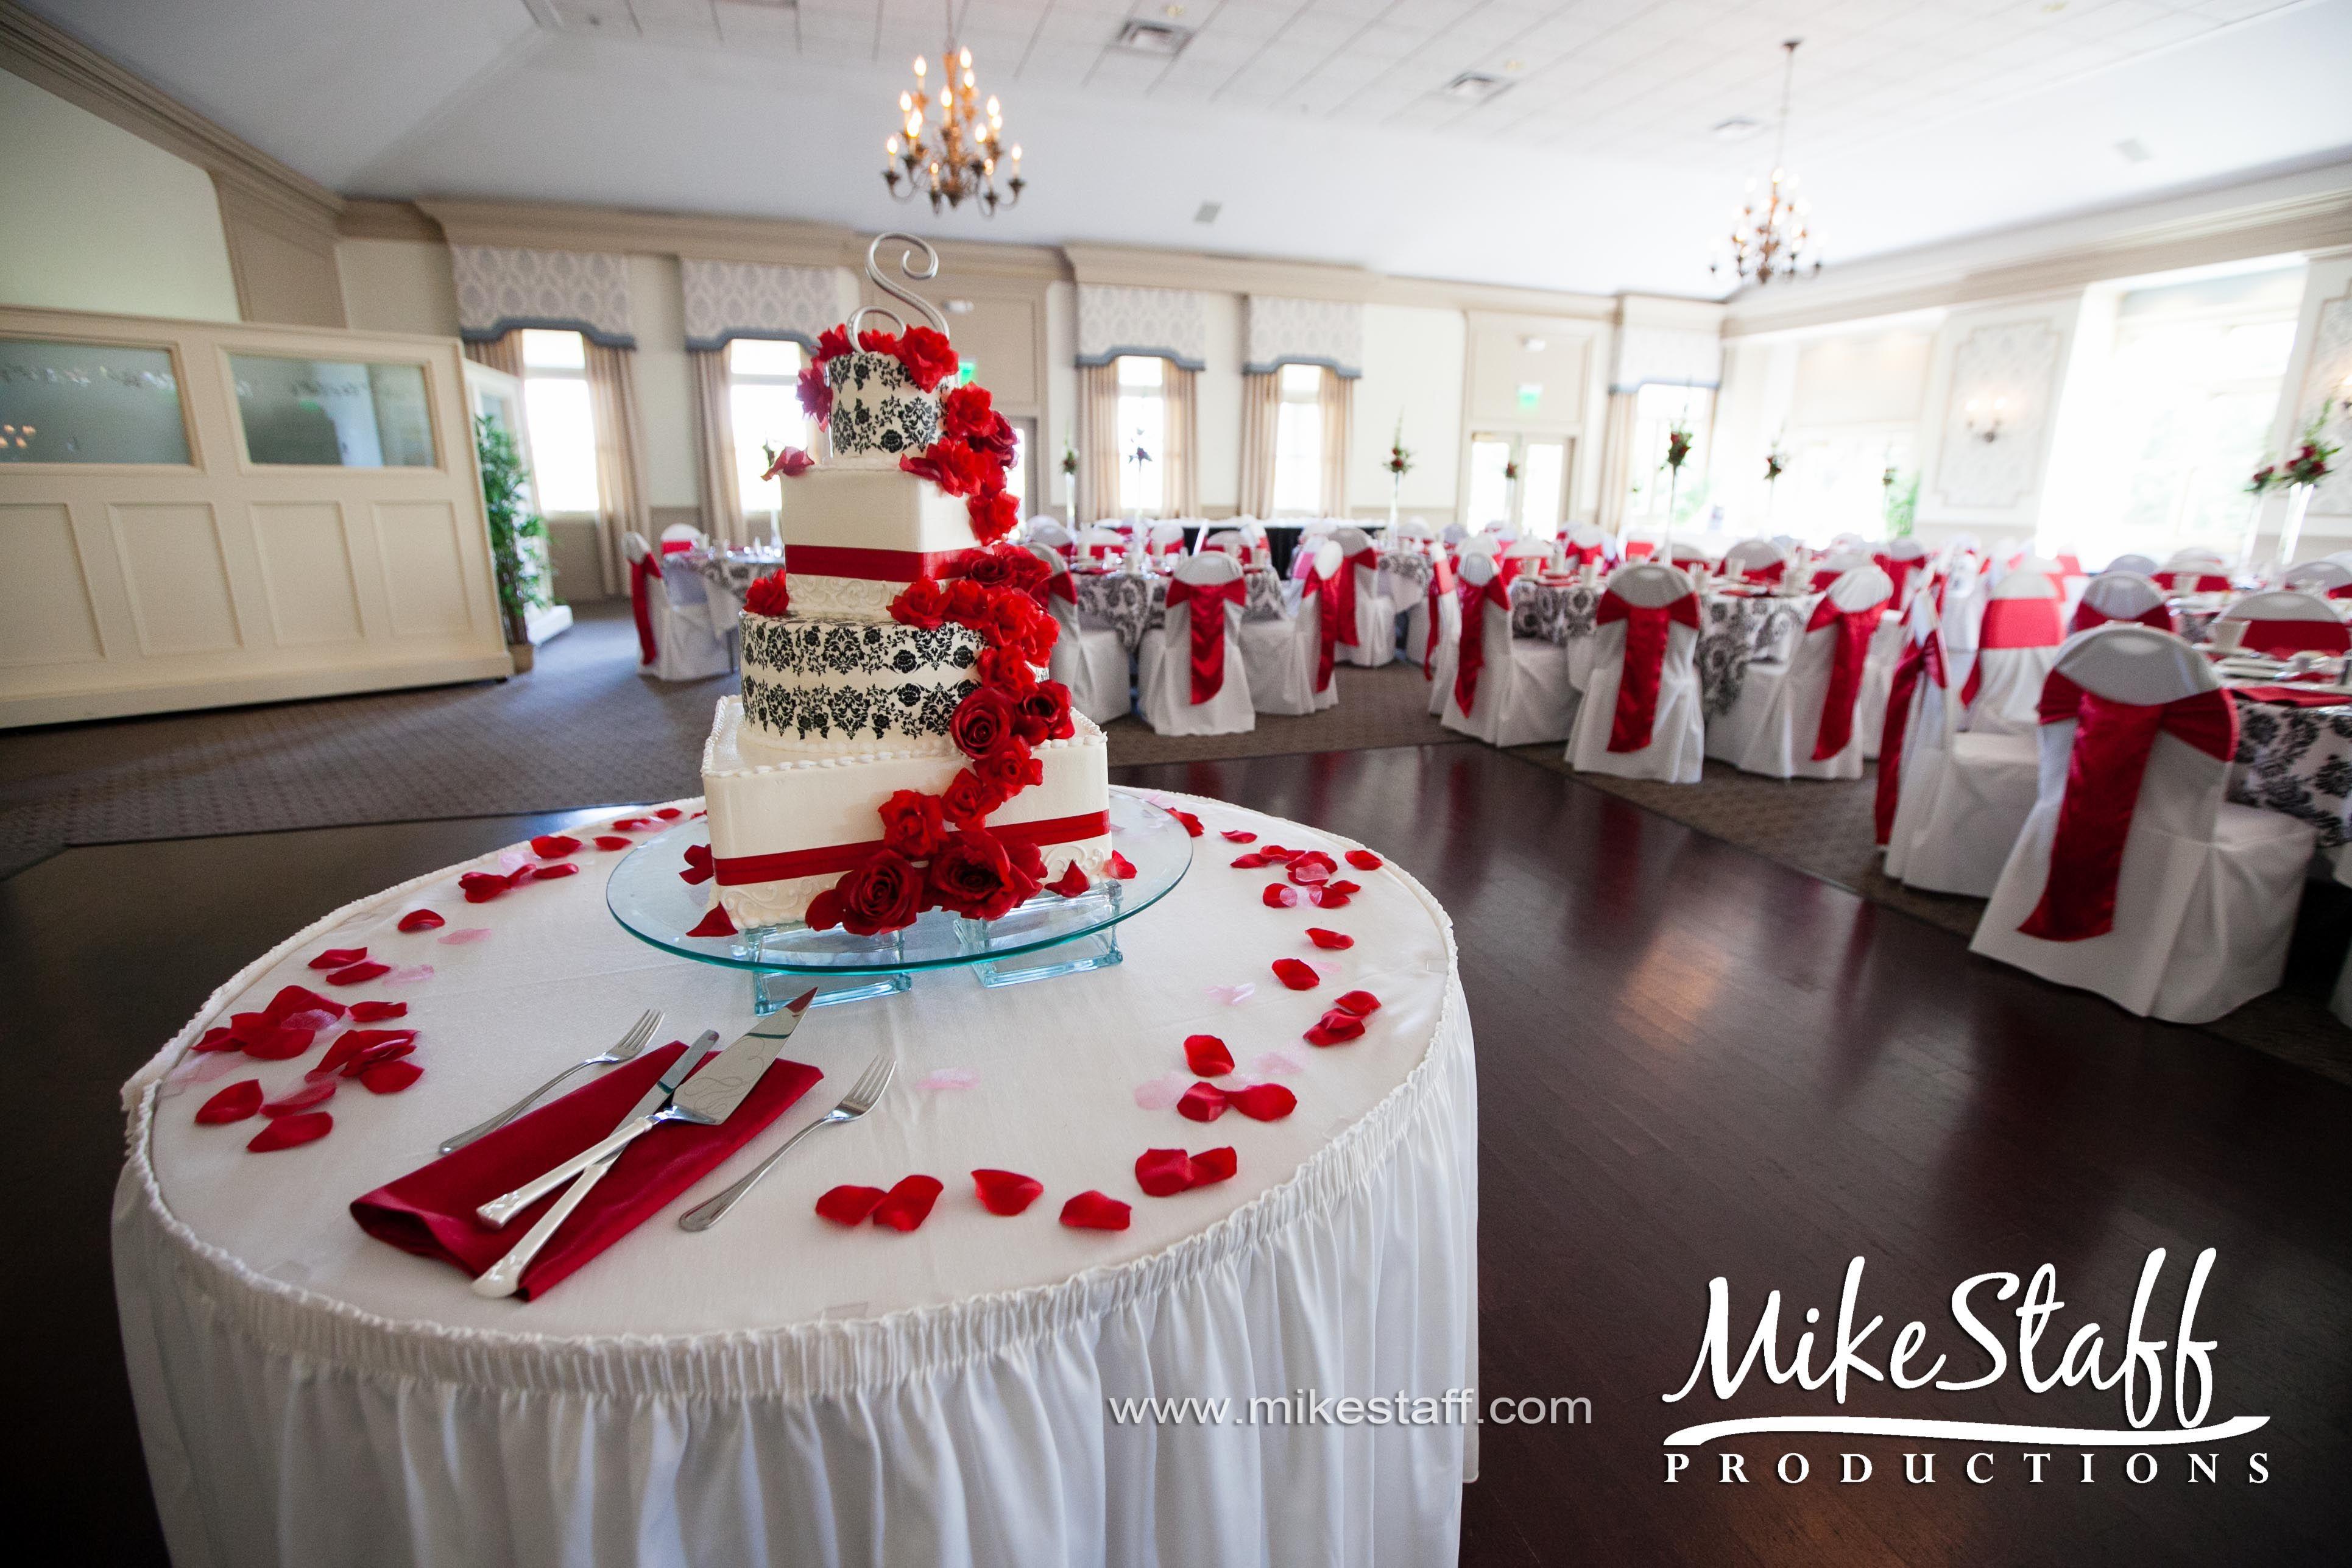 Zebra wedding decorations  wedding cake Michigan wedding Chicago wedding Mike Staff